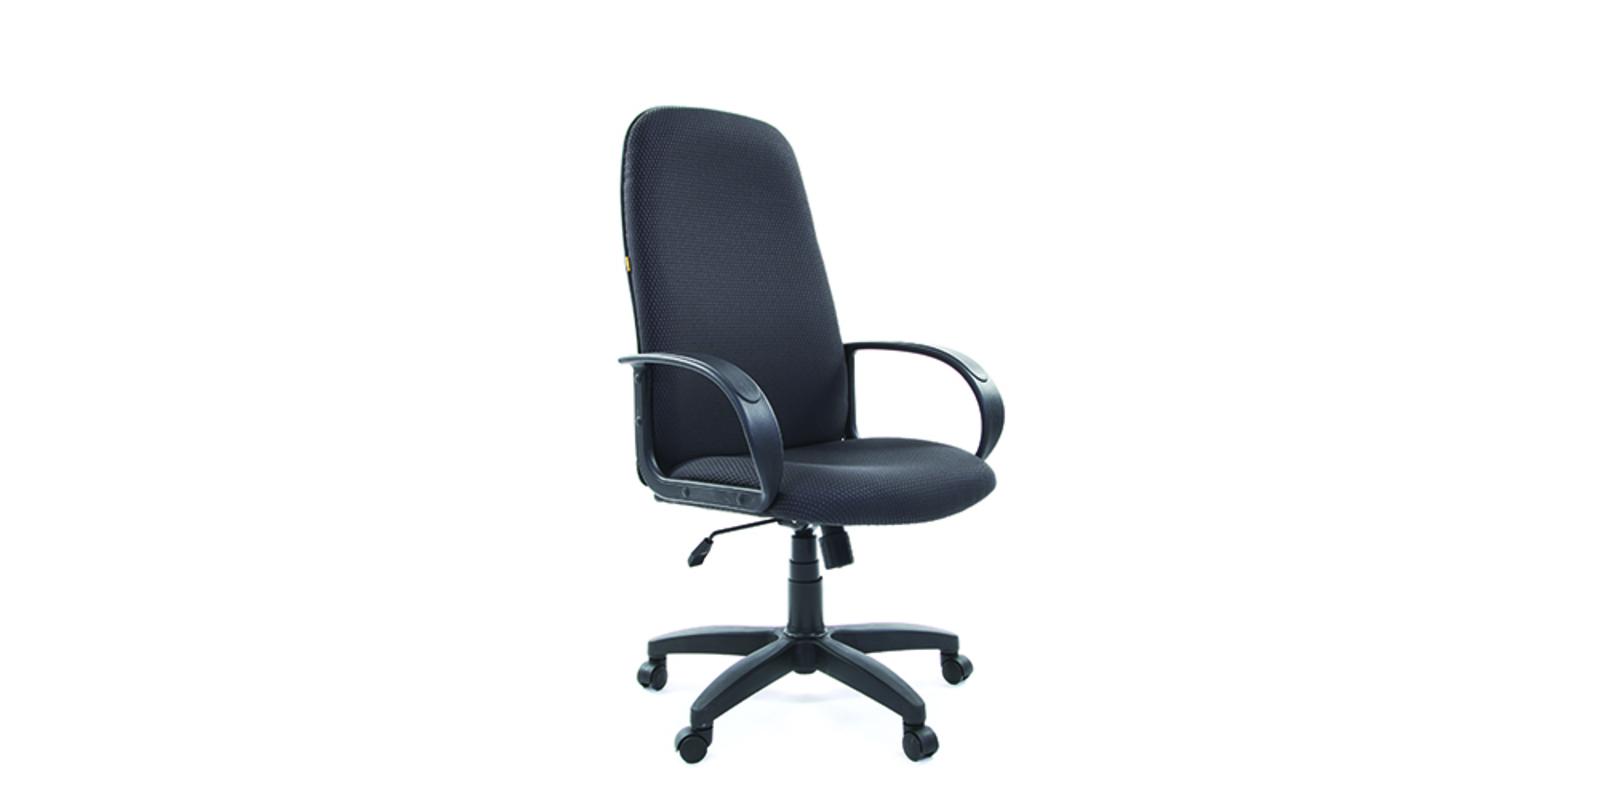 Игровое кресло HomeMe Chairman 279 от Homeme.ru